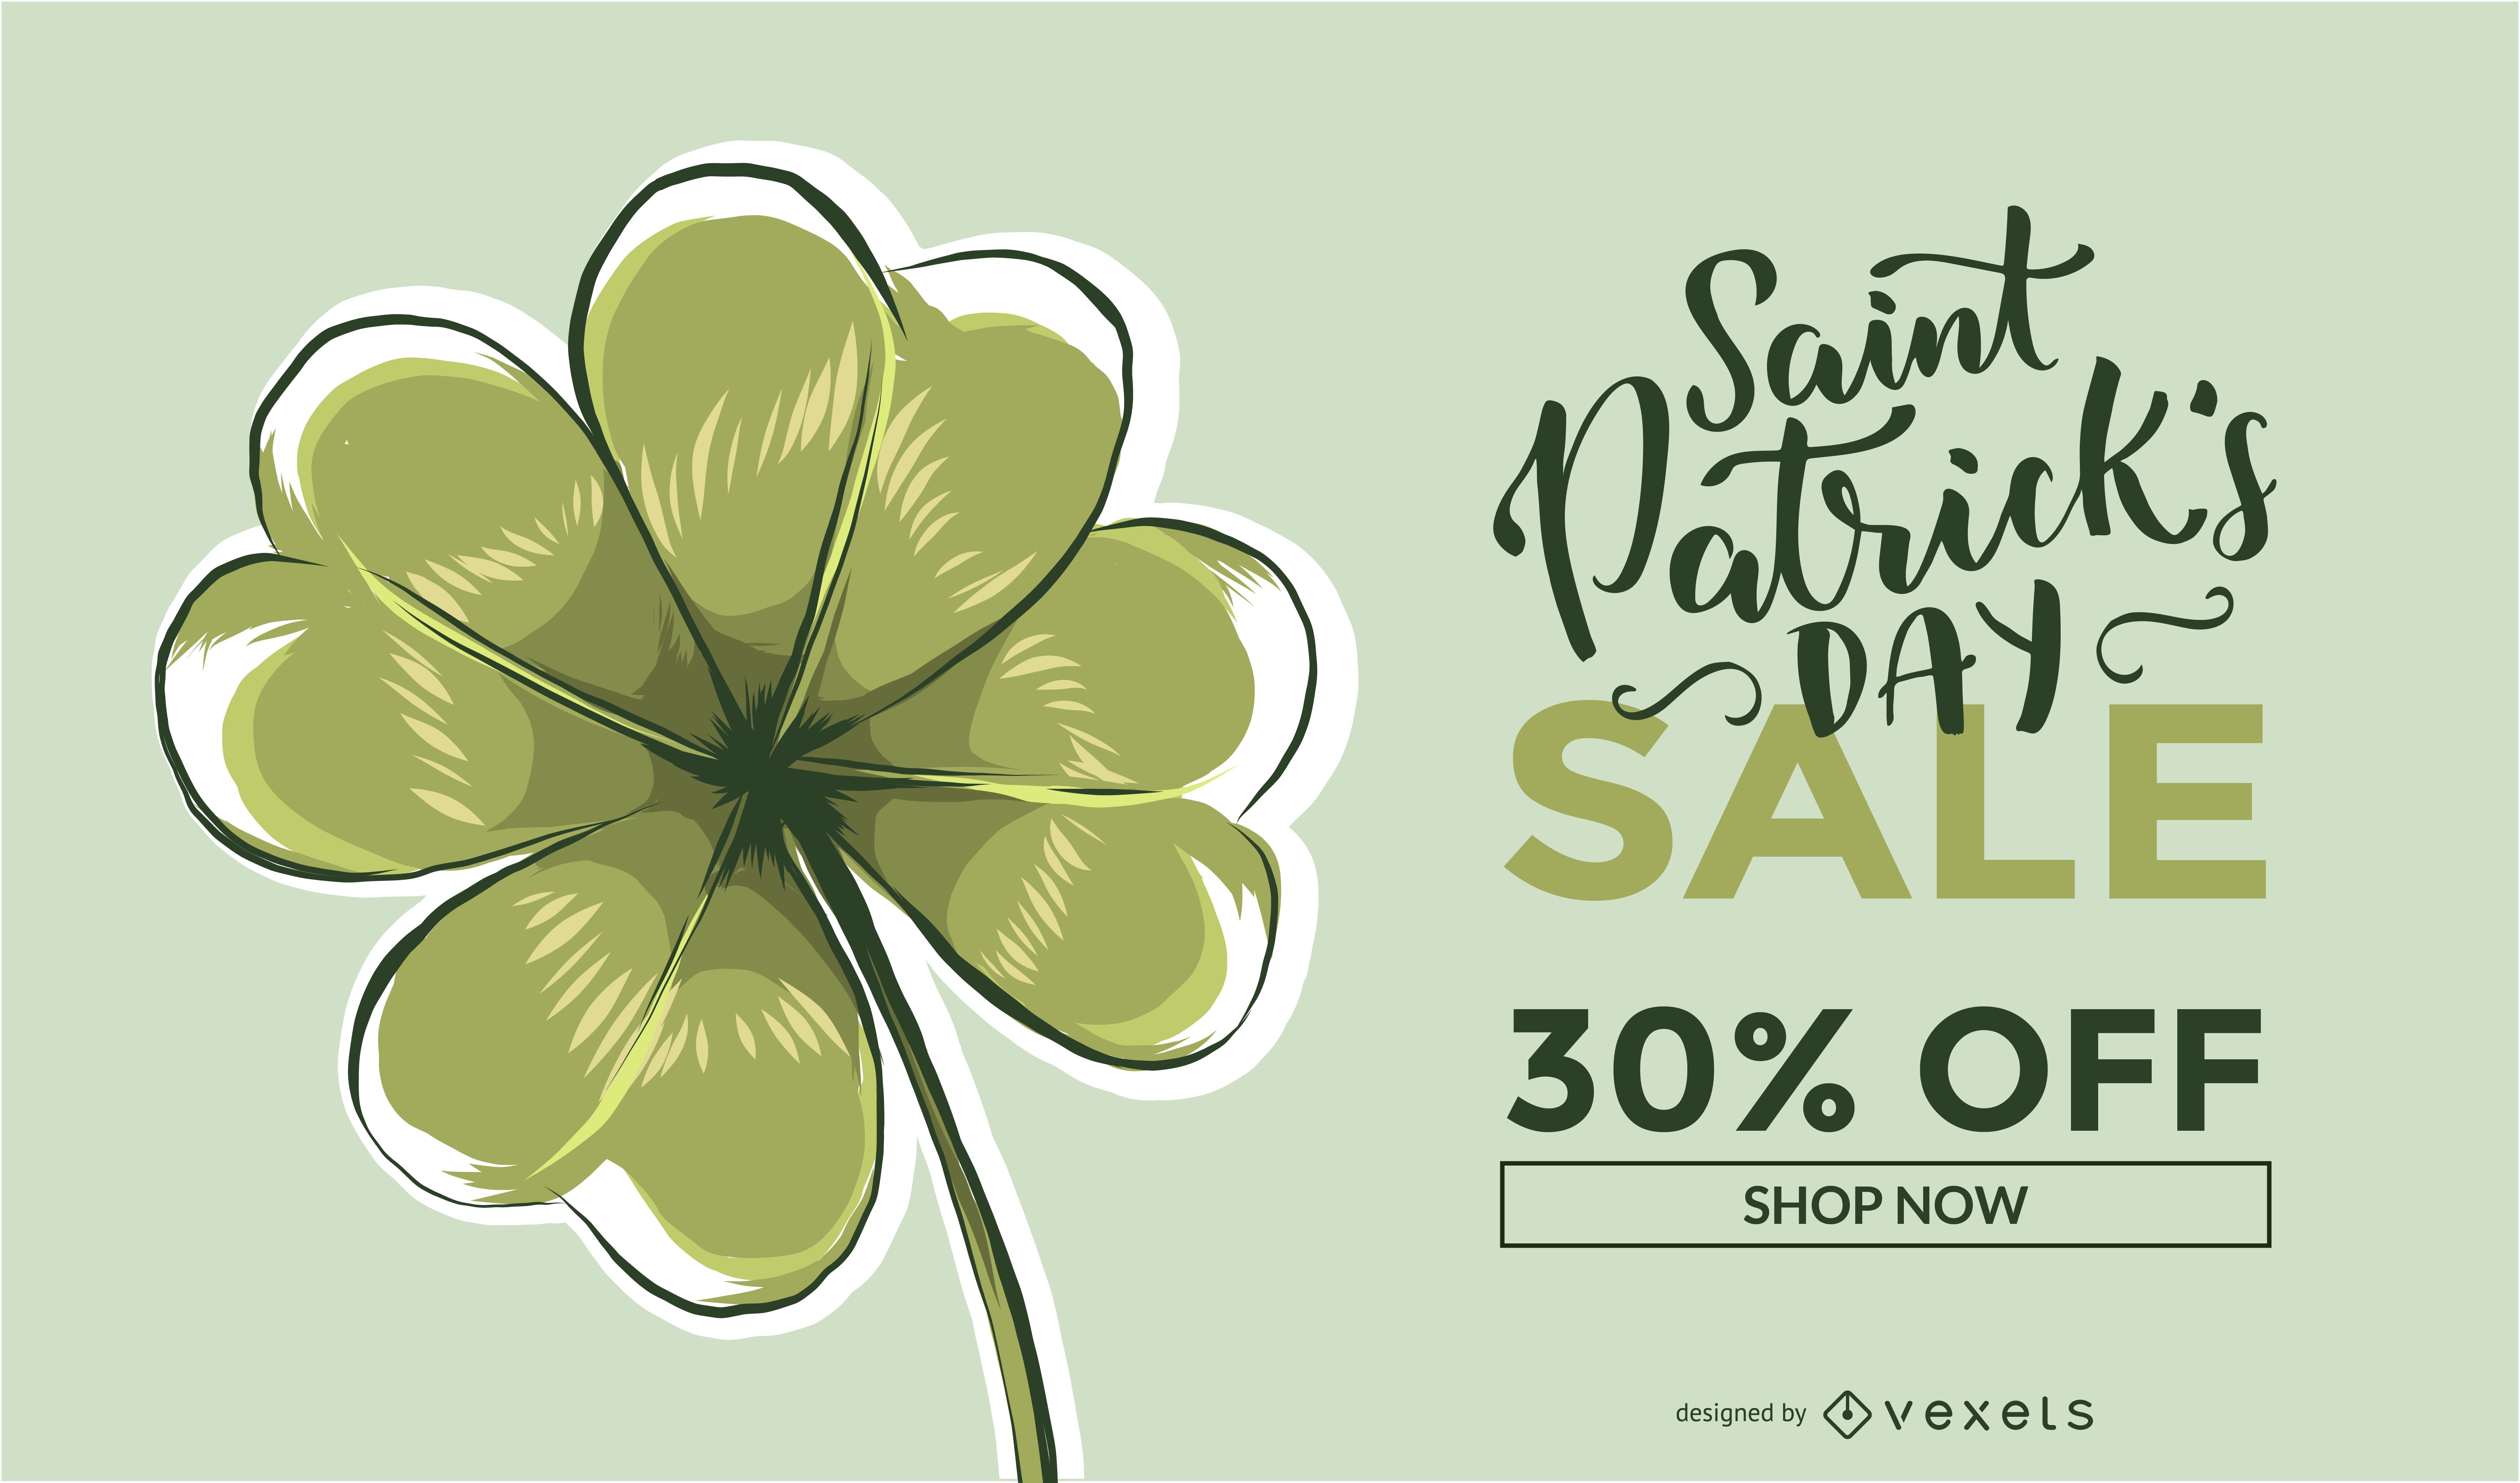 Saint Patrick's Sale Promo Design